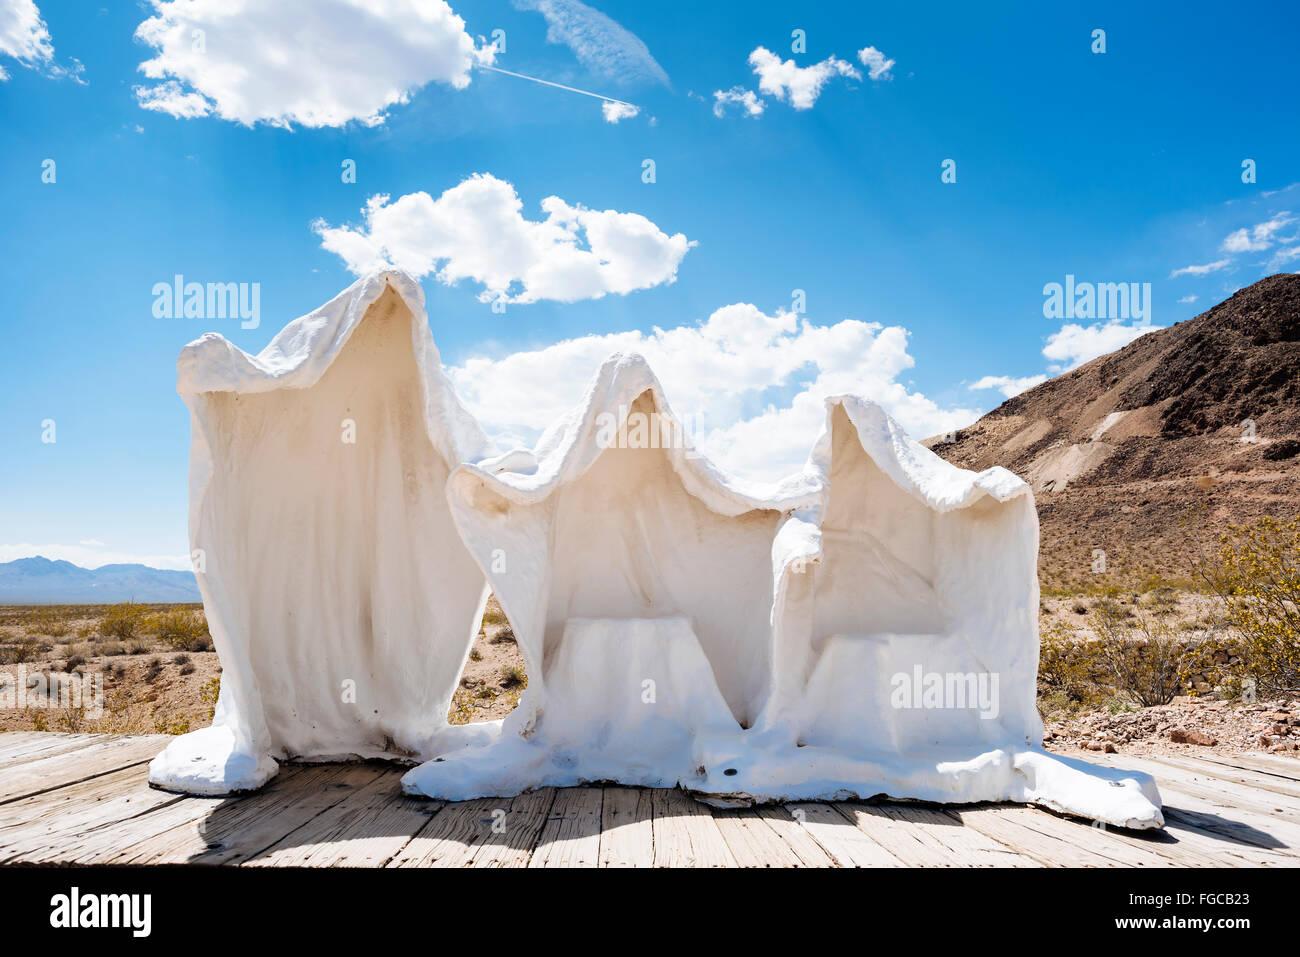 A sculpture by Albert Szukalski in Goldwell Open Air Museum, Rhyolite, Nevada - Stock Image